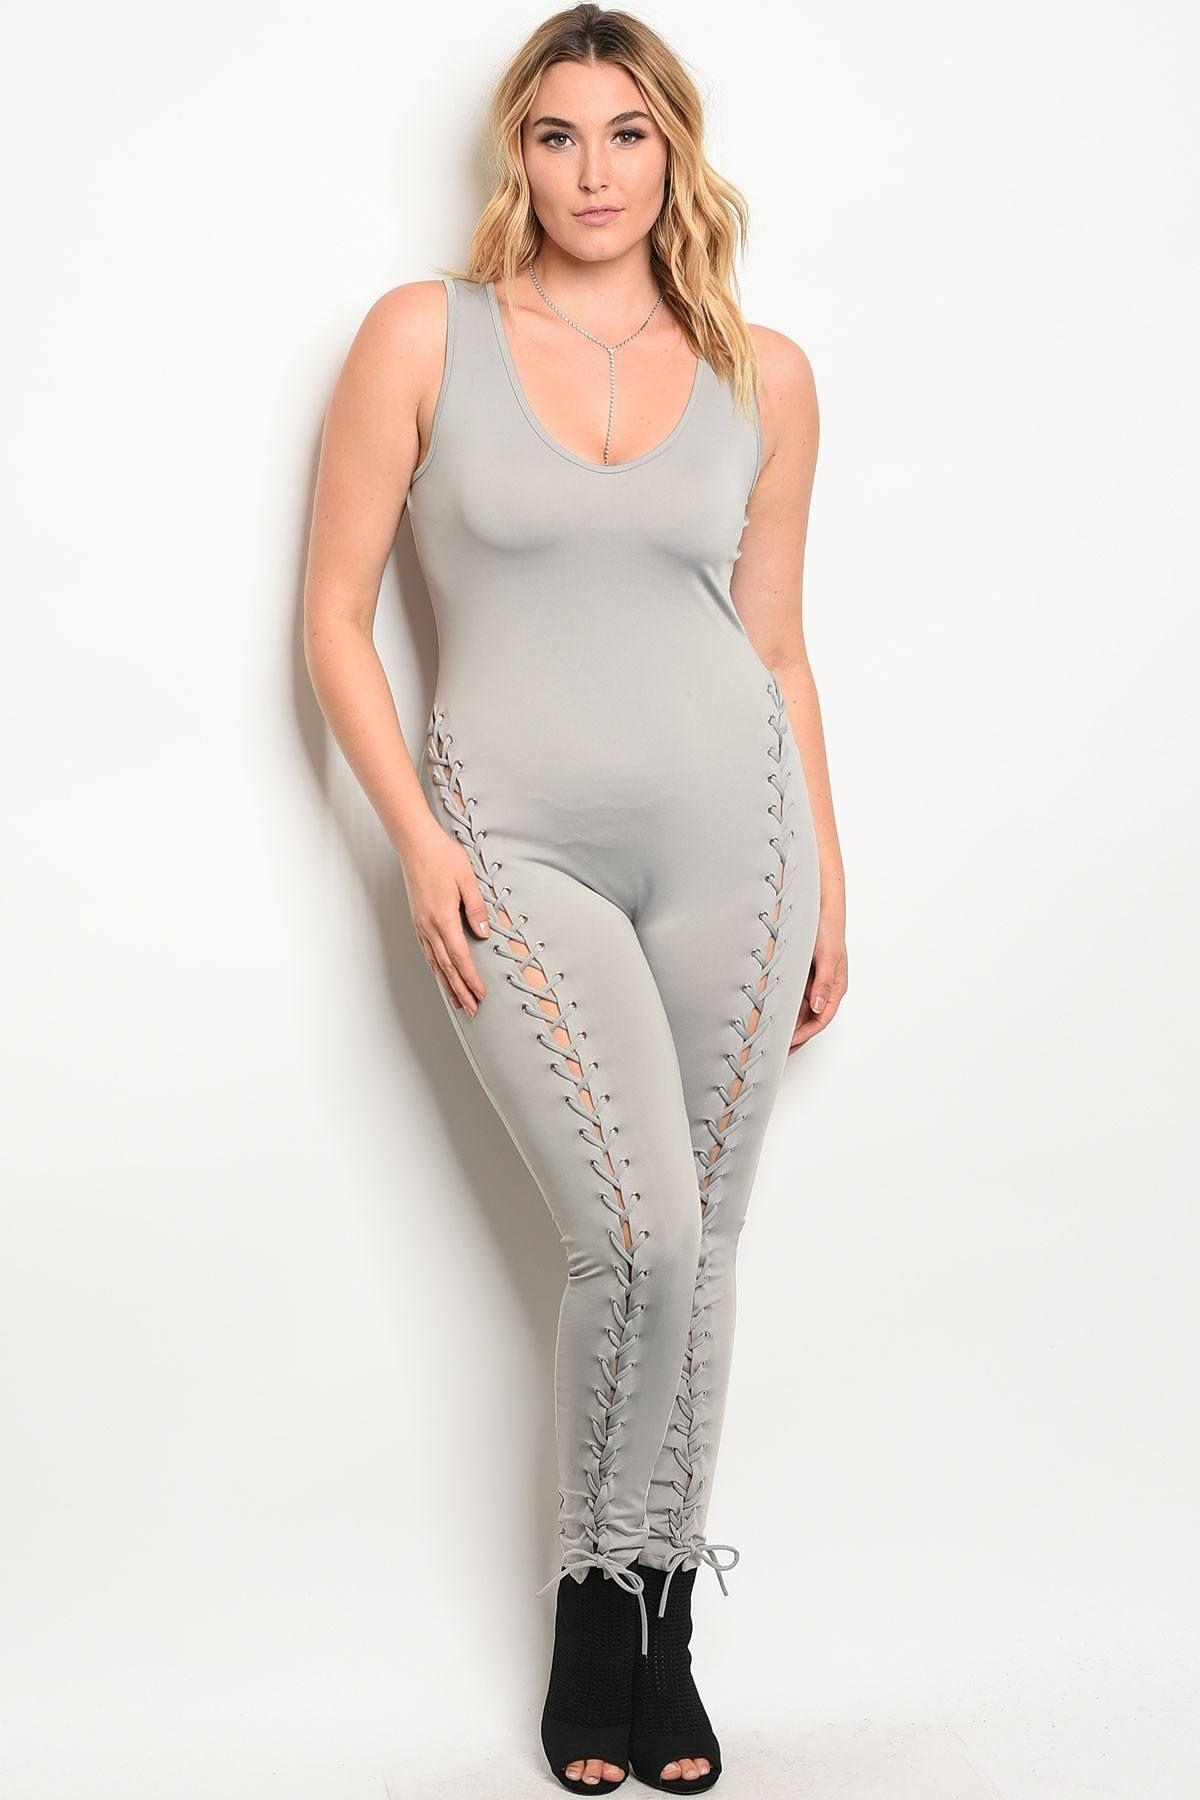 a68c9318347 Plus size spandex blend jumpsuit with lace up details along the leg and a v  neckline